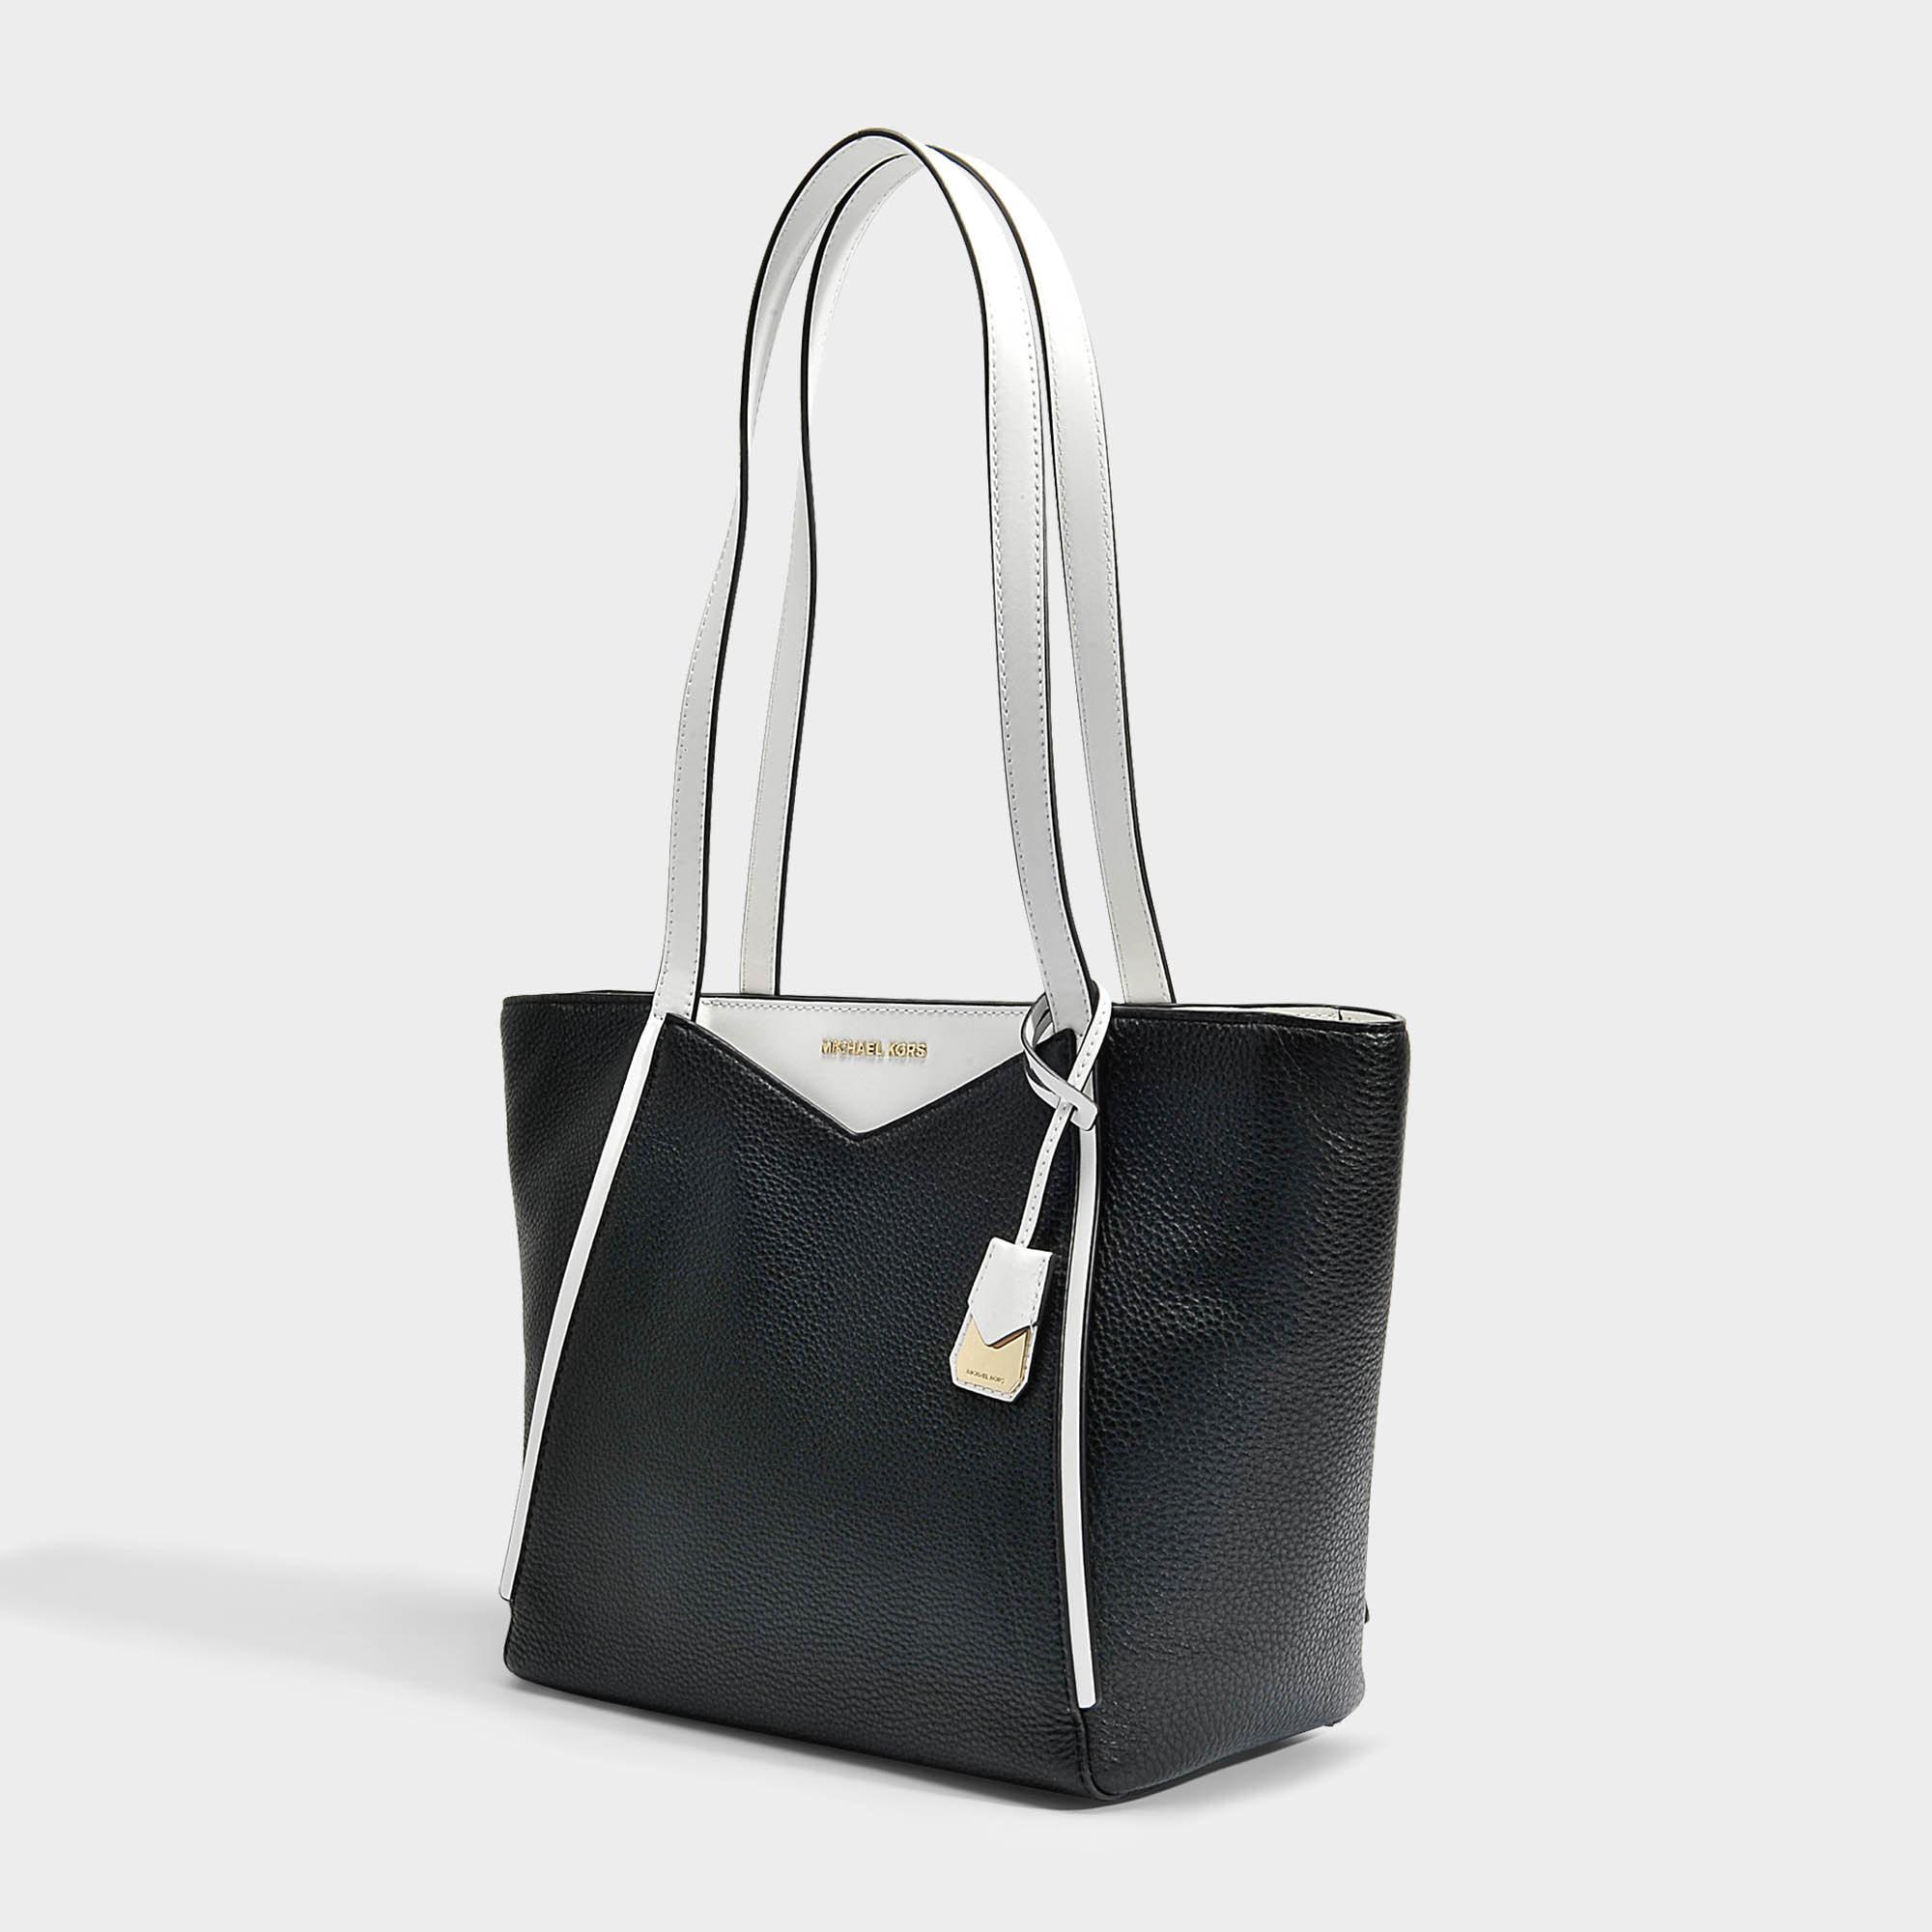 Petit sac cabas top zip en cuir noir et blanc